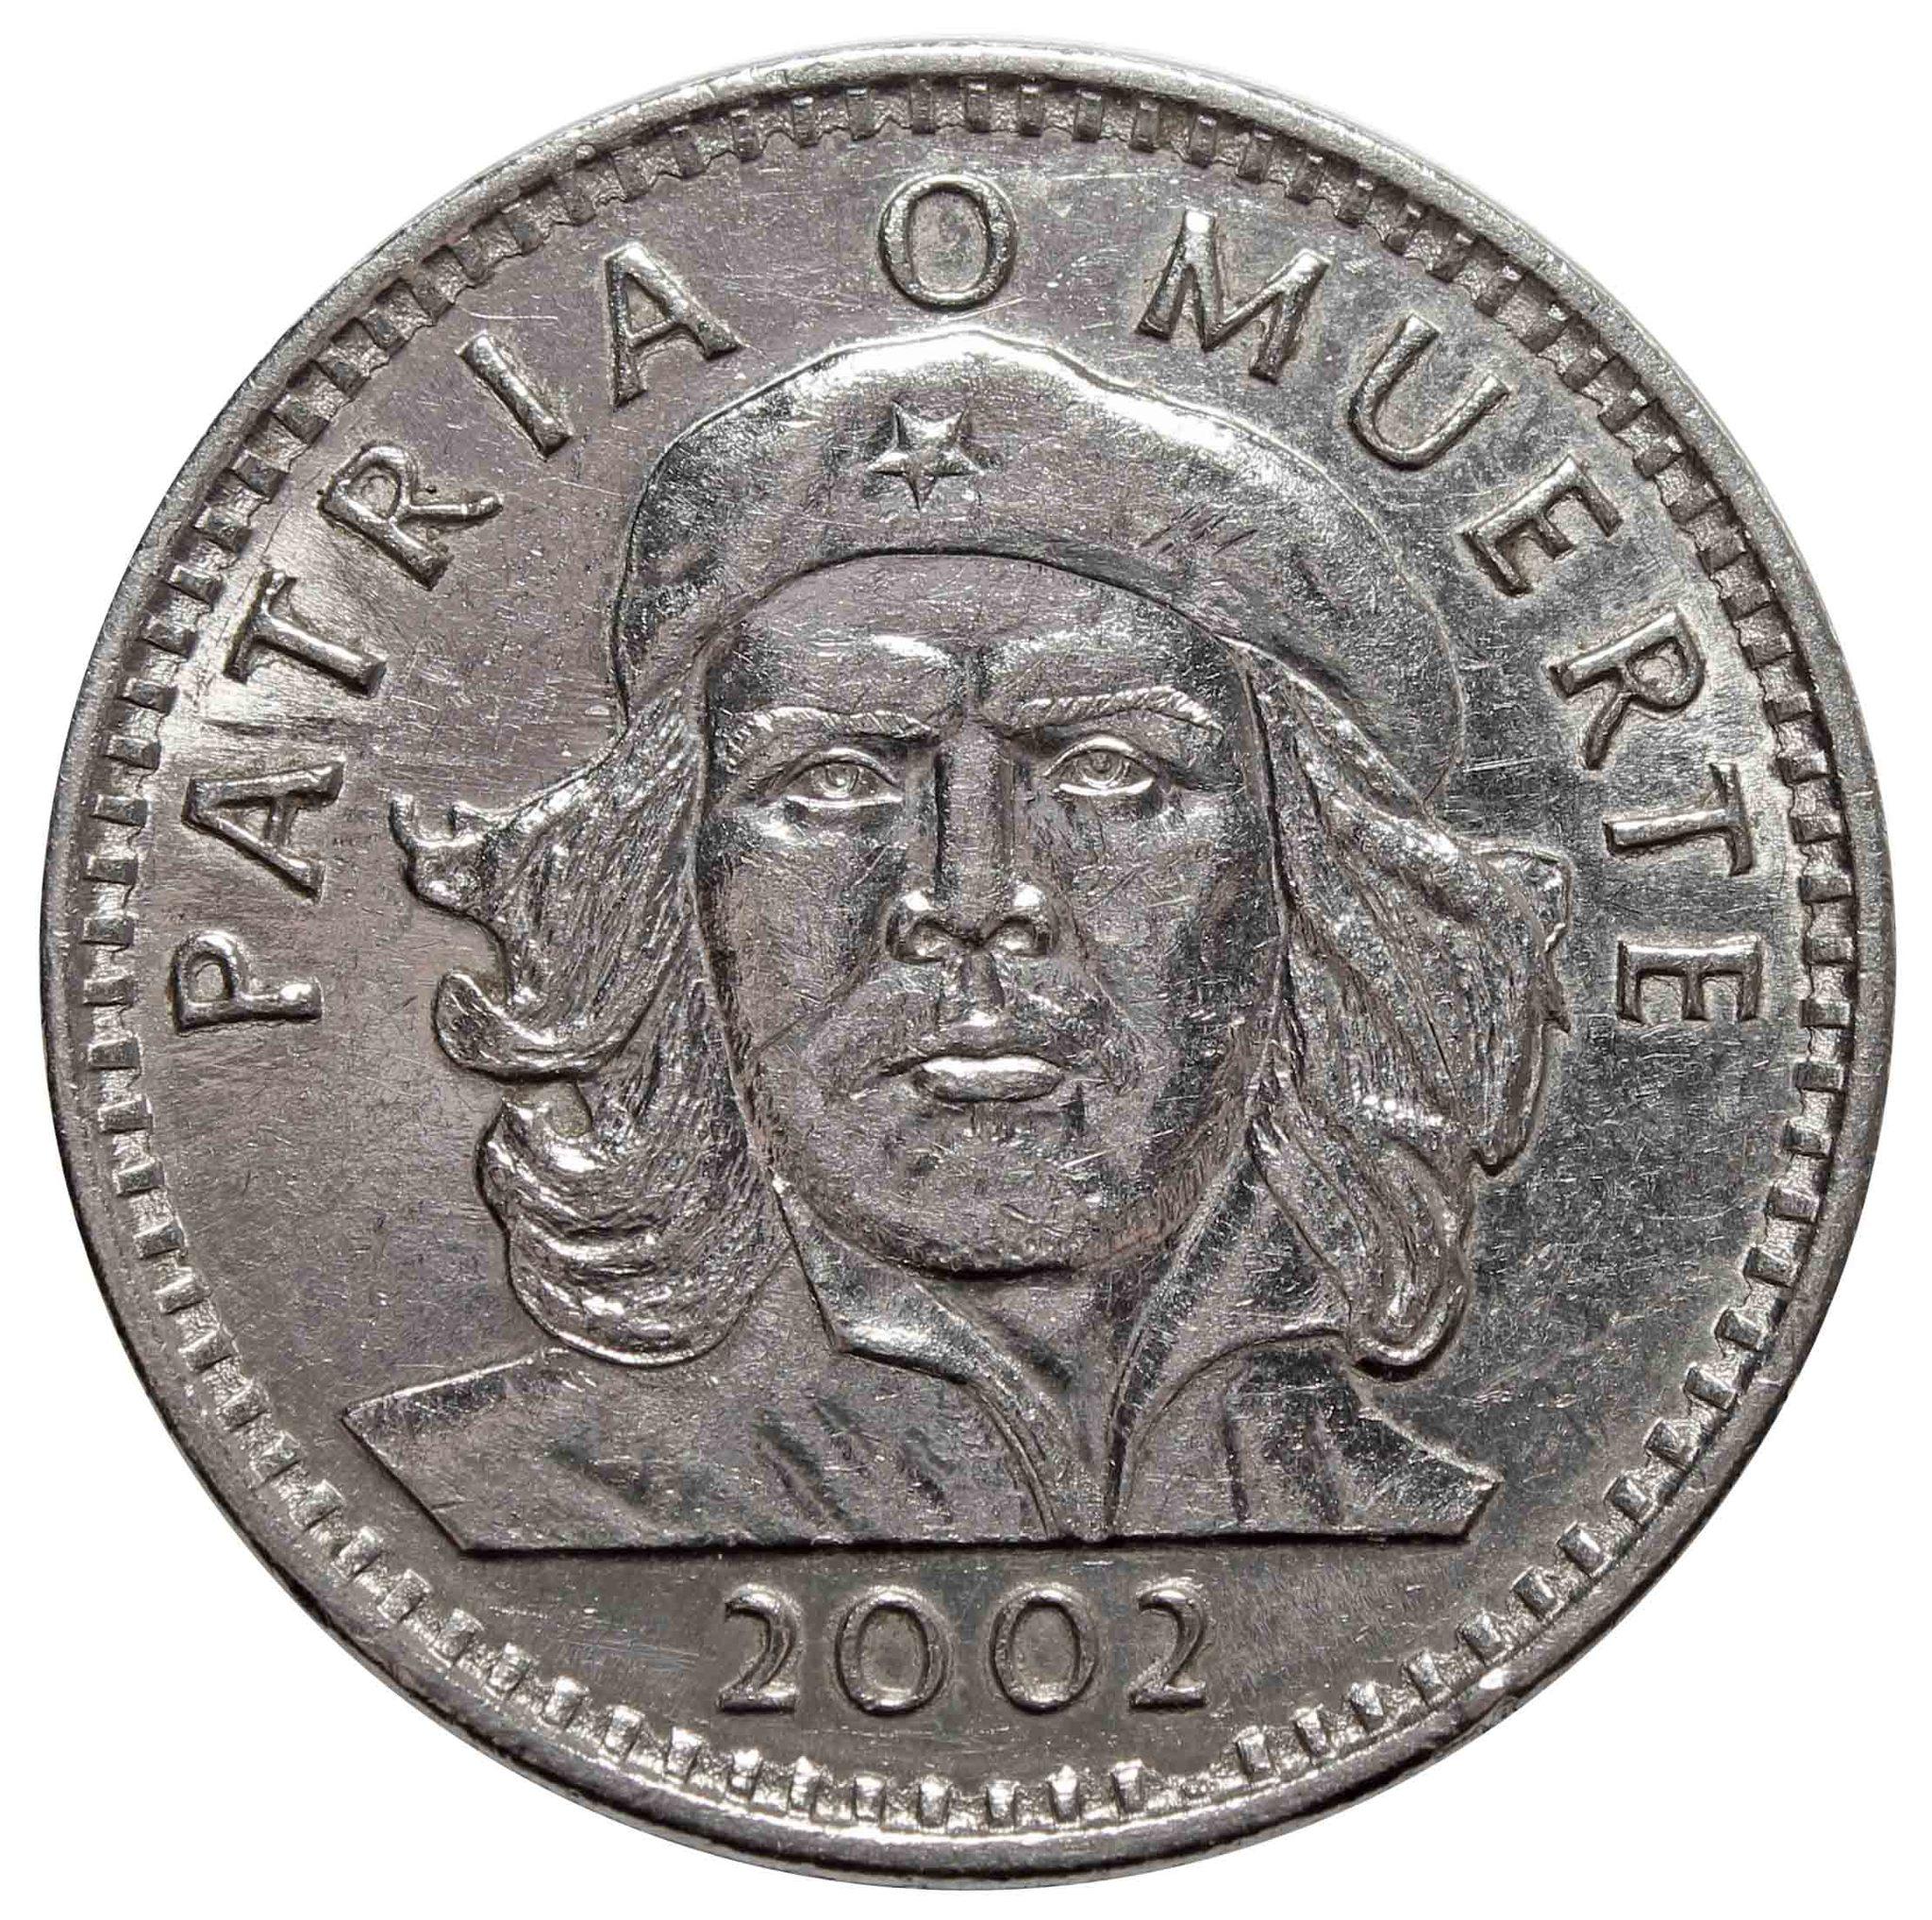 3 Песо 2002 г. КУБА. Че Гевара. XF №2